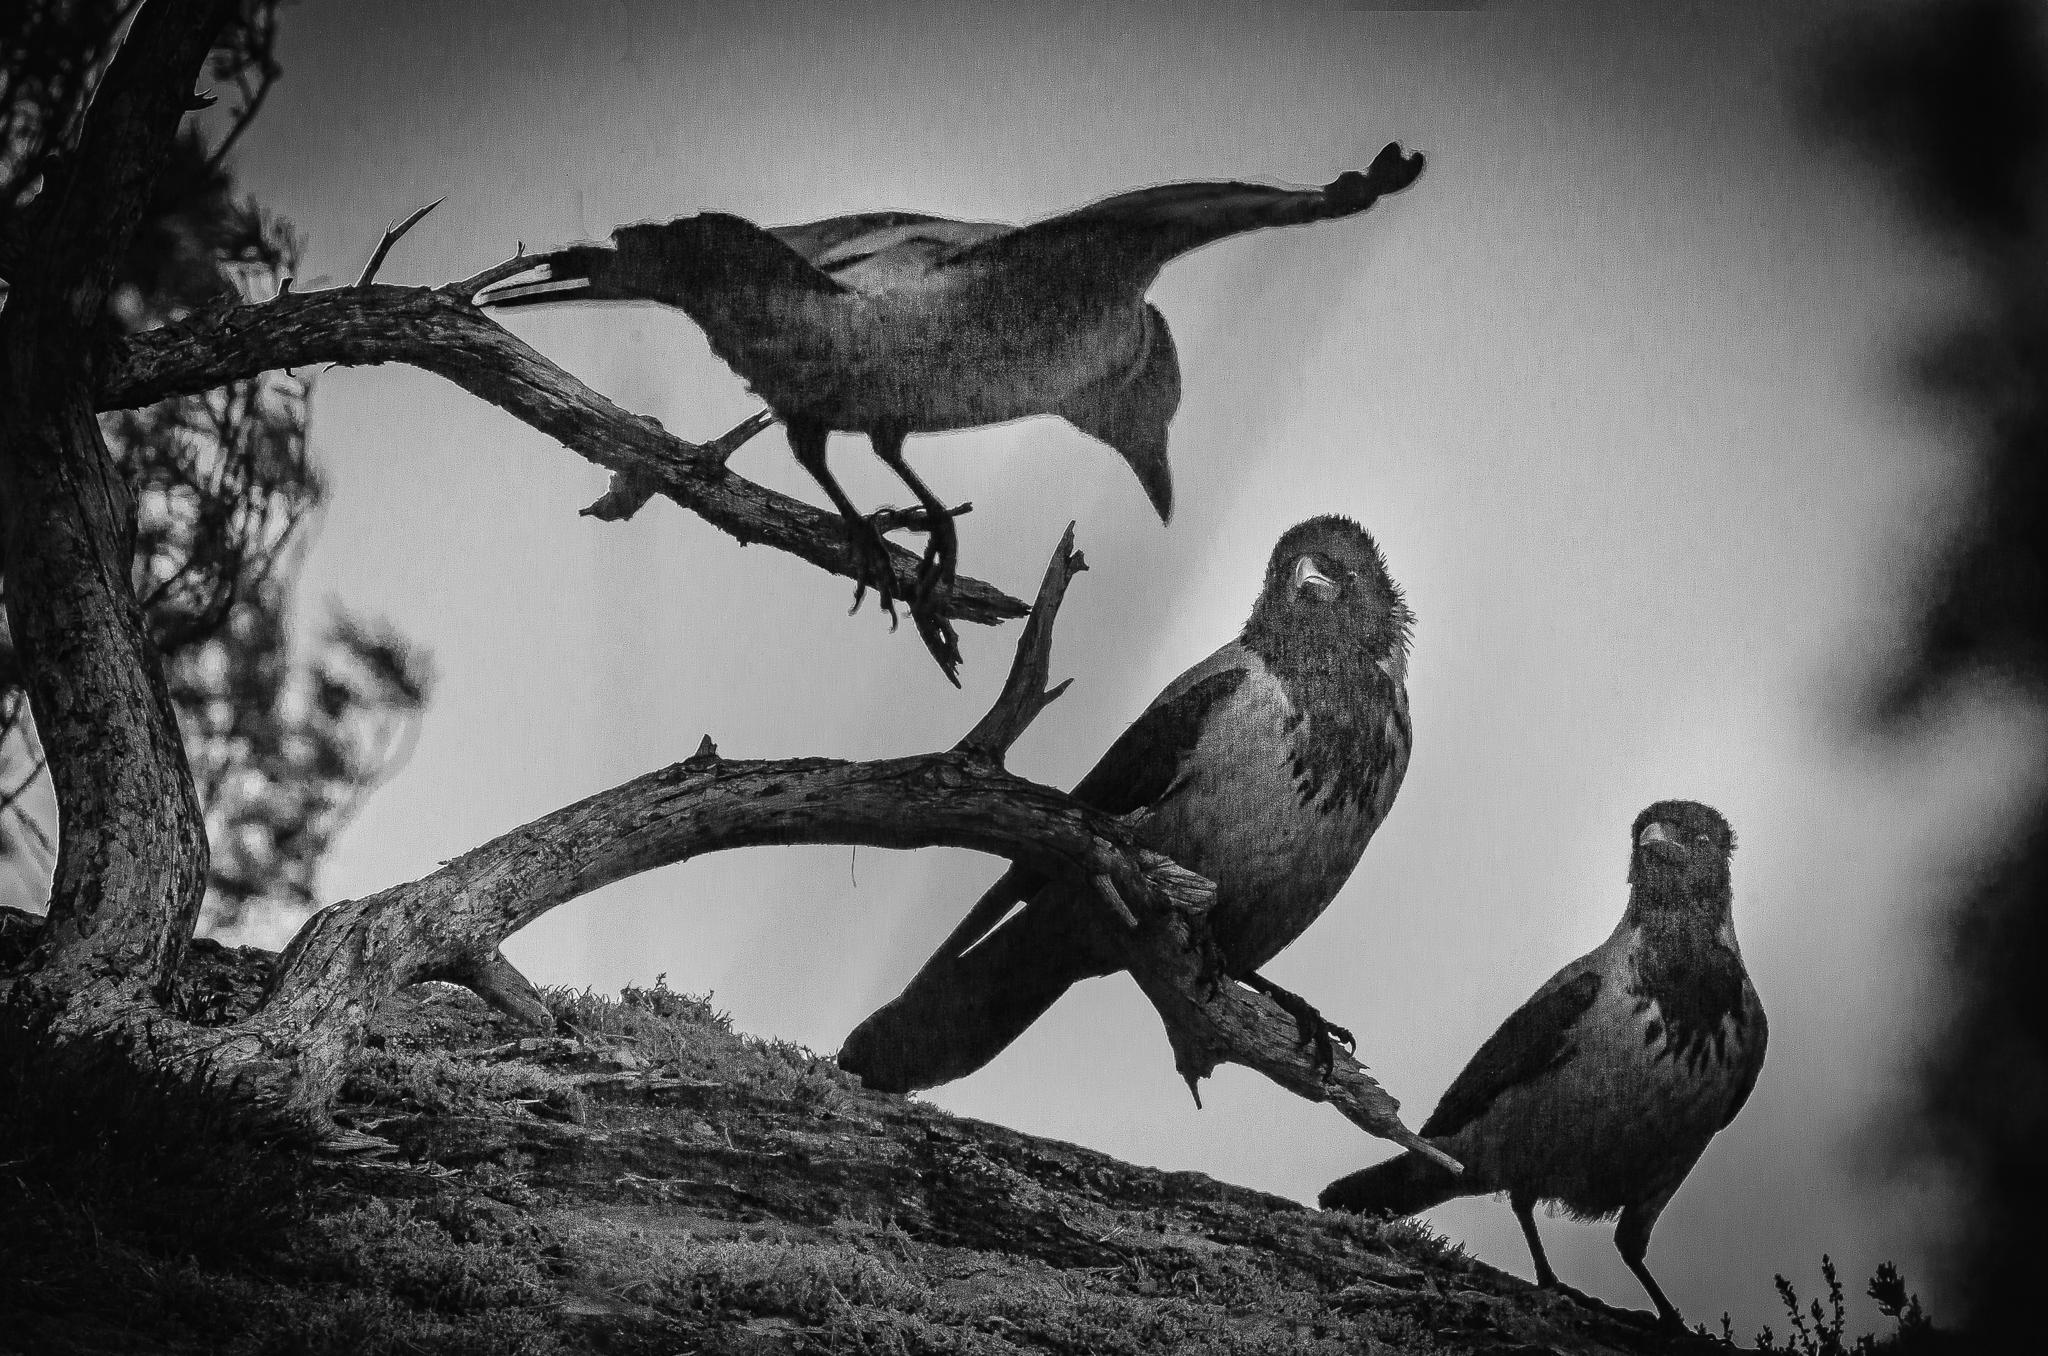 Tre kråker på ei grein